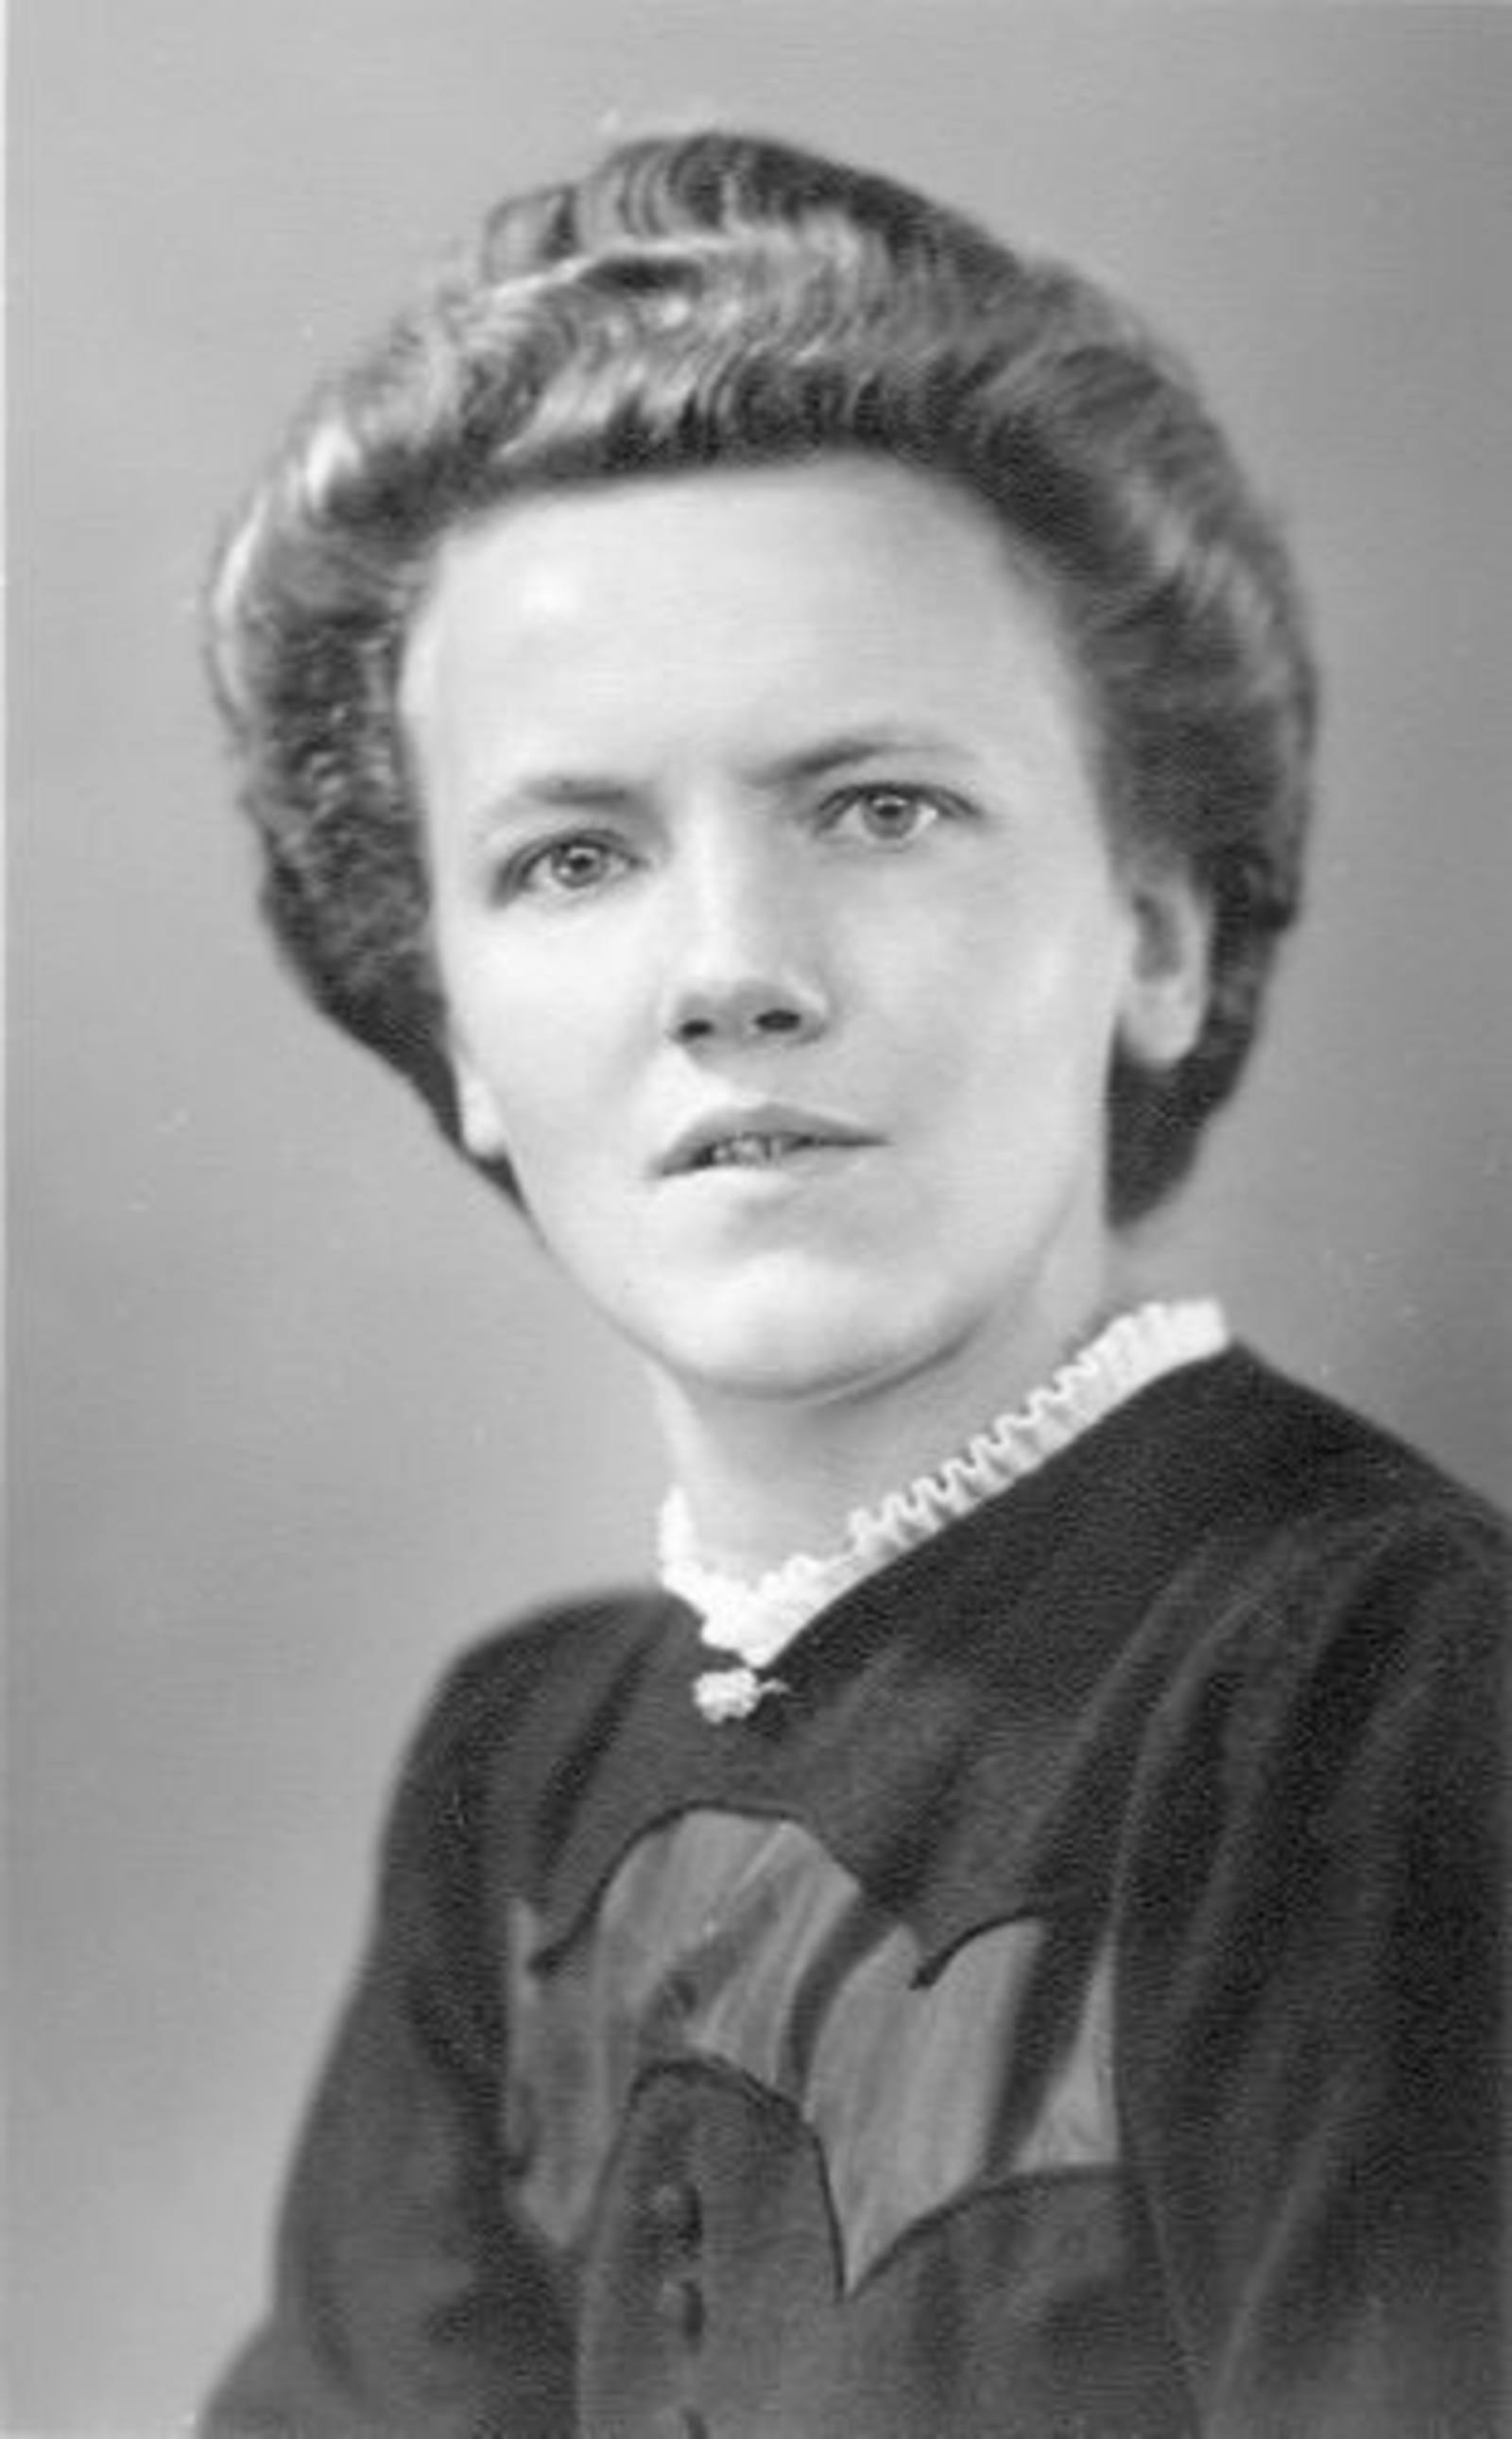 04 Wies Marij 1943± portret